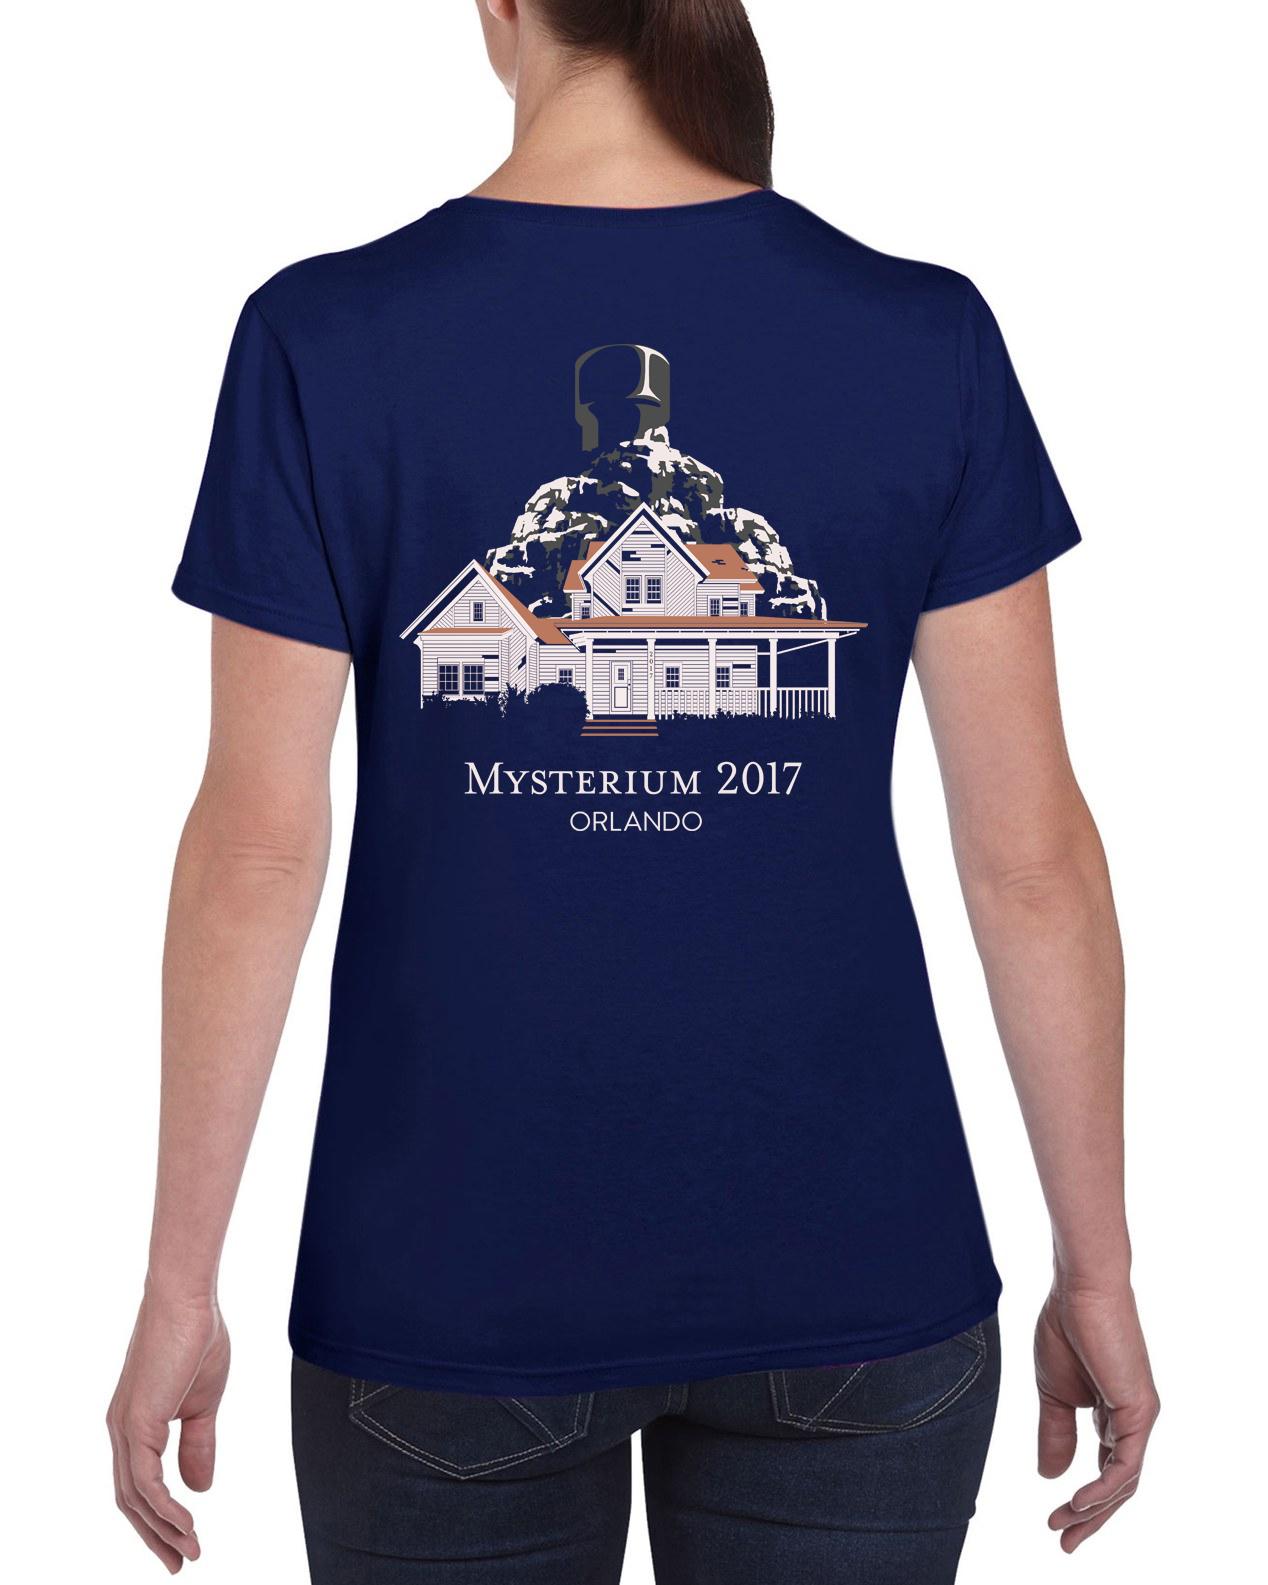 Shirt design images 2017 - Mysterium 2017 Back Logo